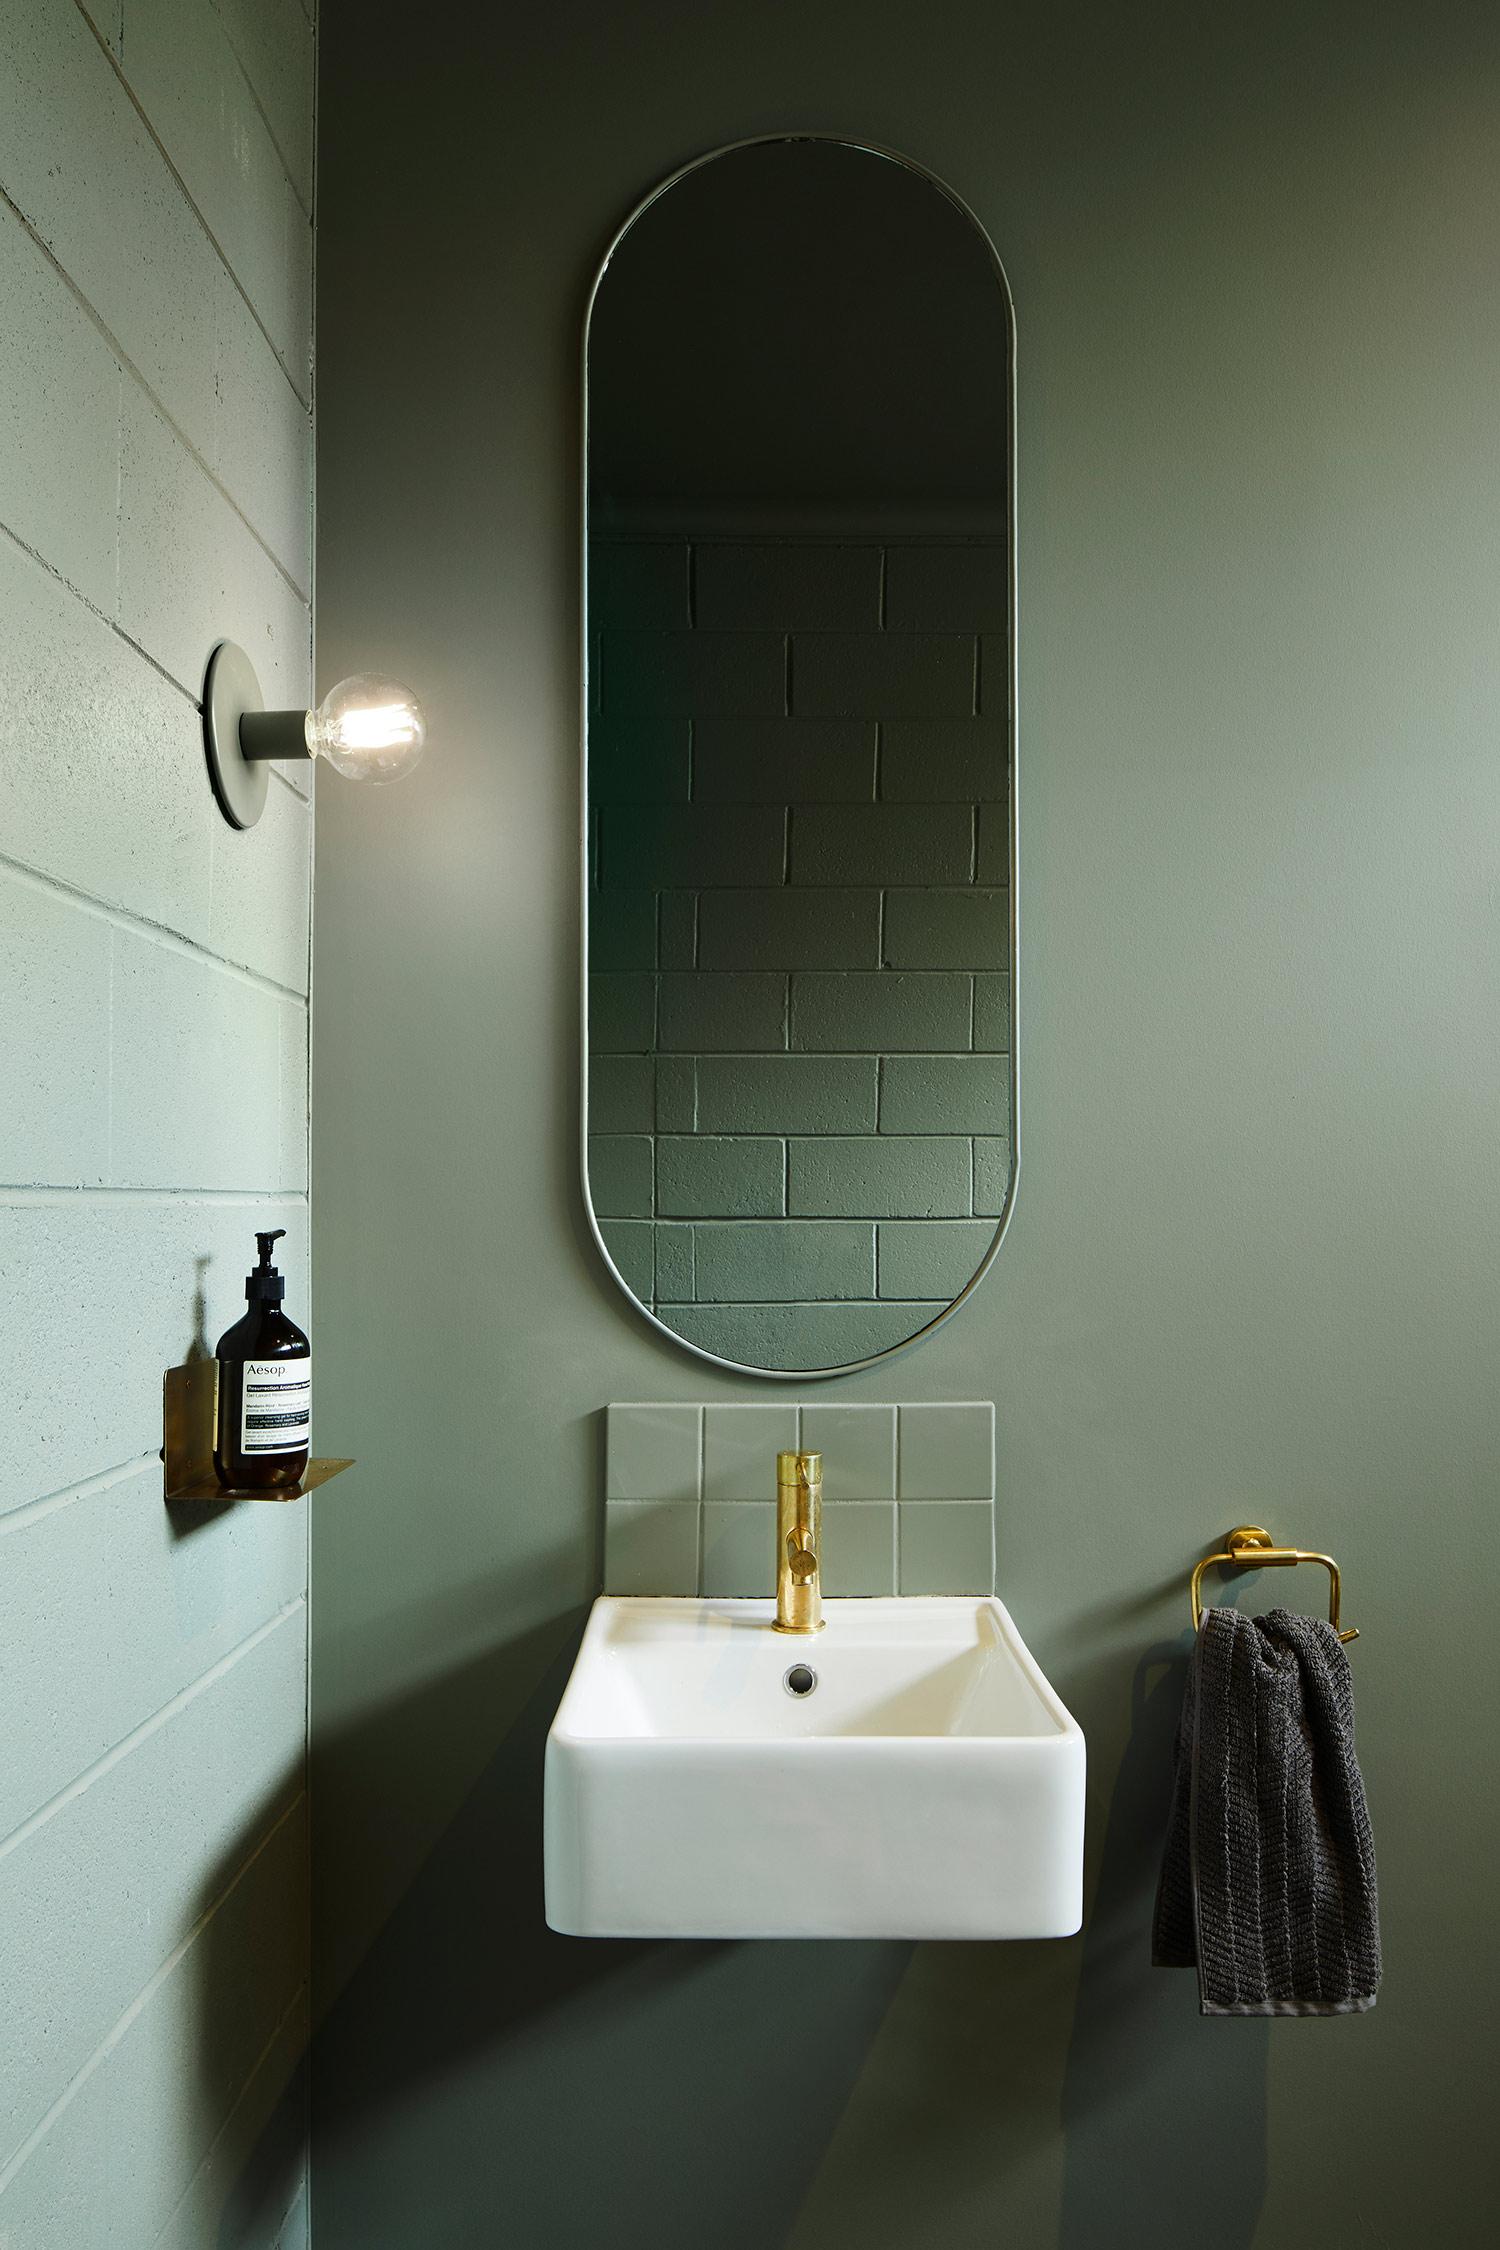 co-working-bathroom-03-1500px.jpeg